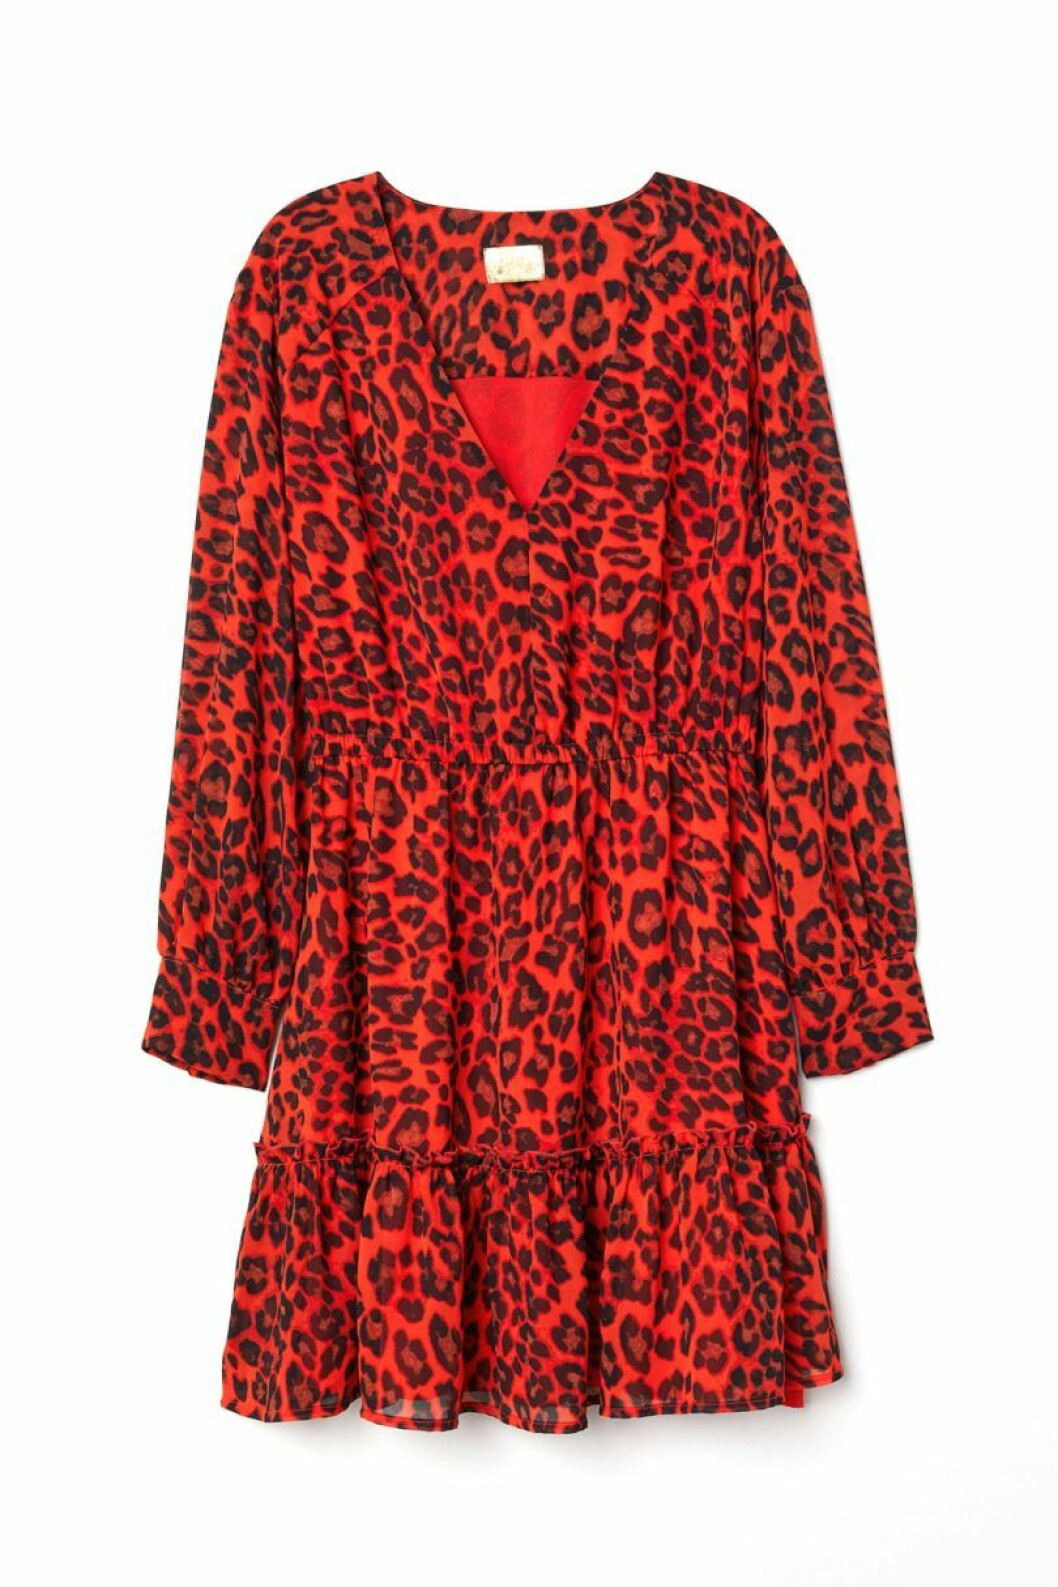 klänning-leopard-röd-hm